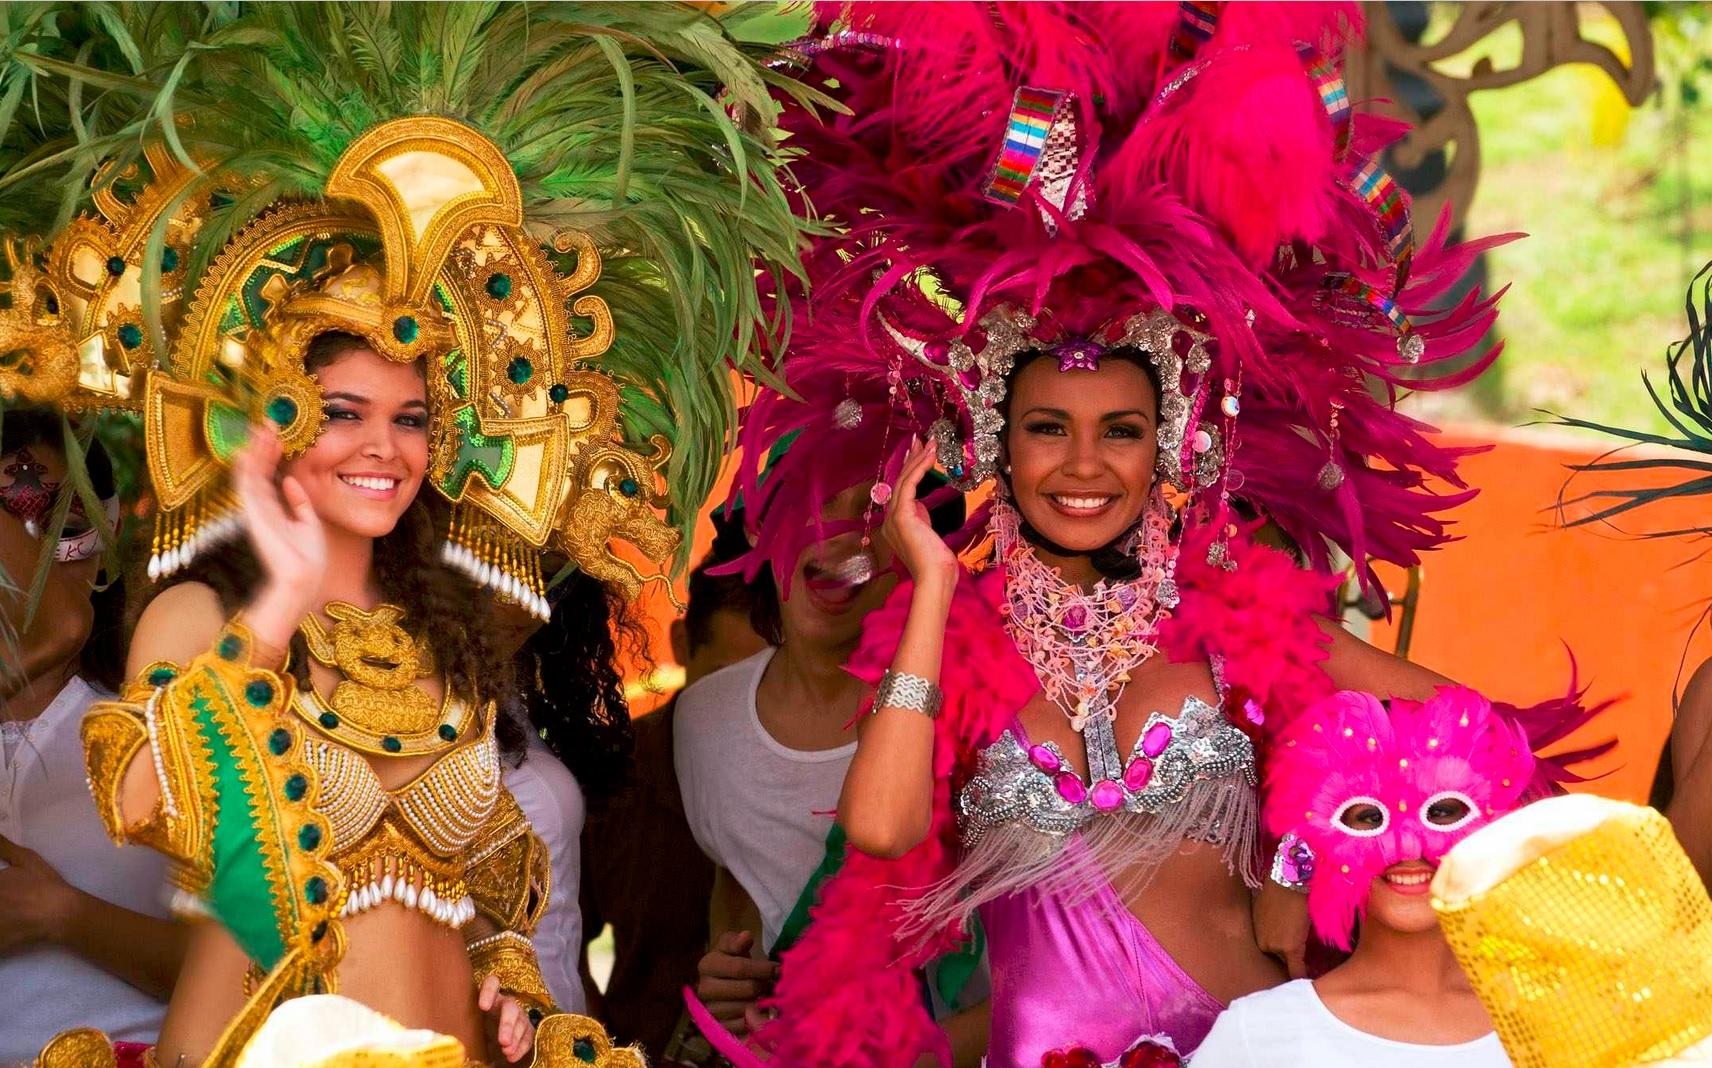 Carneval in Panama